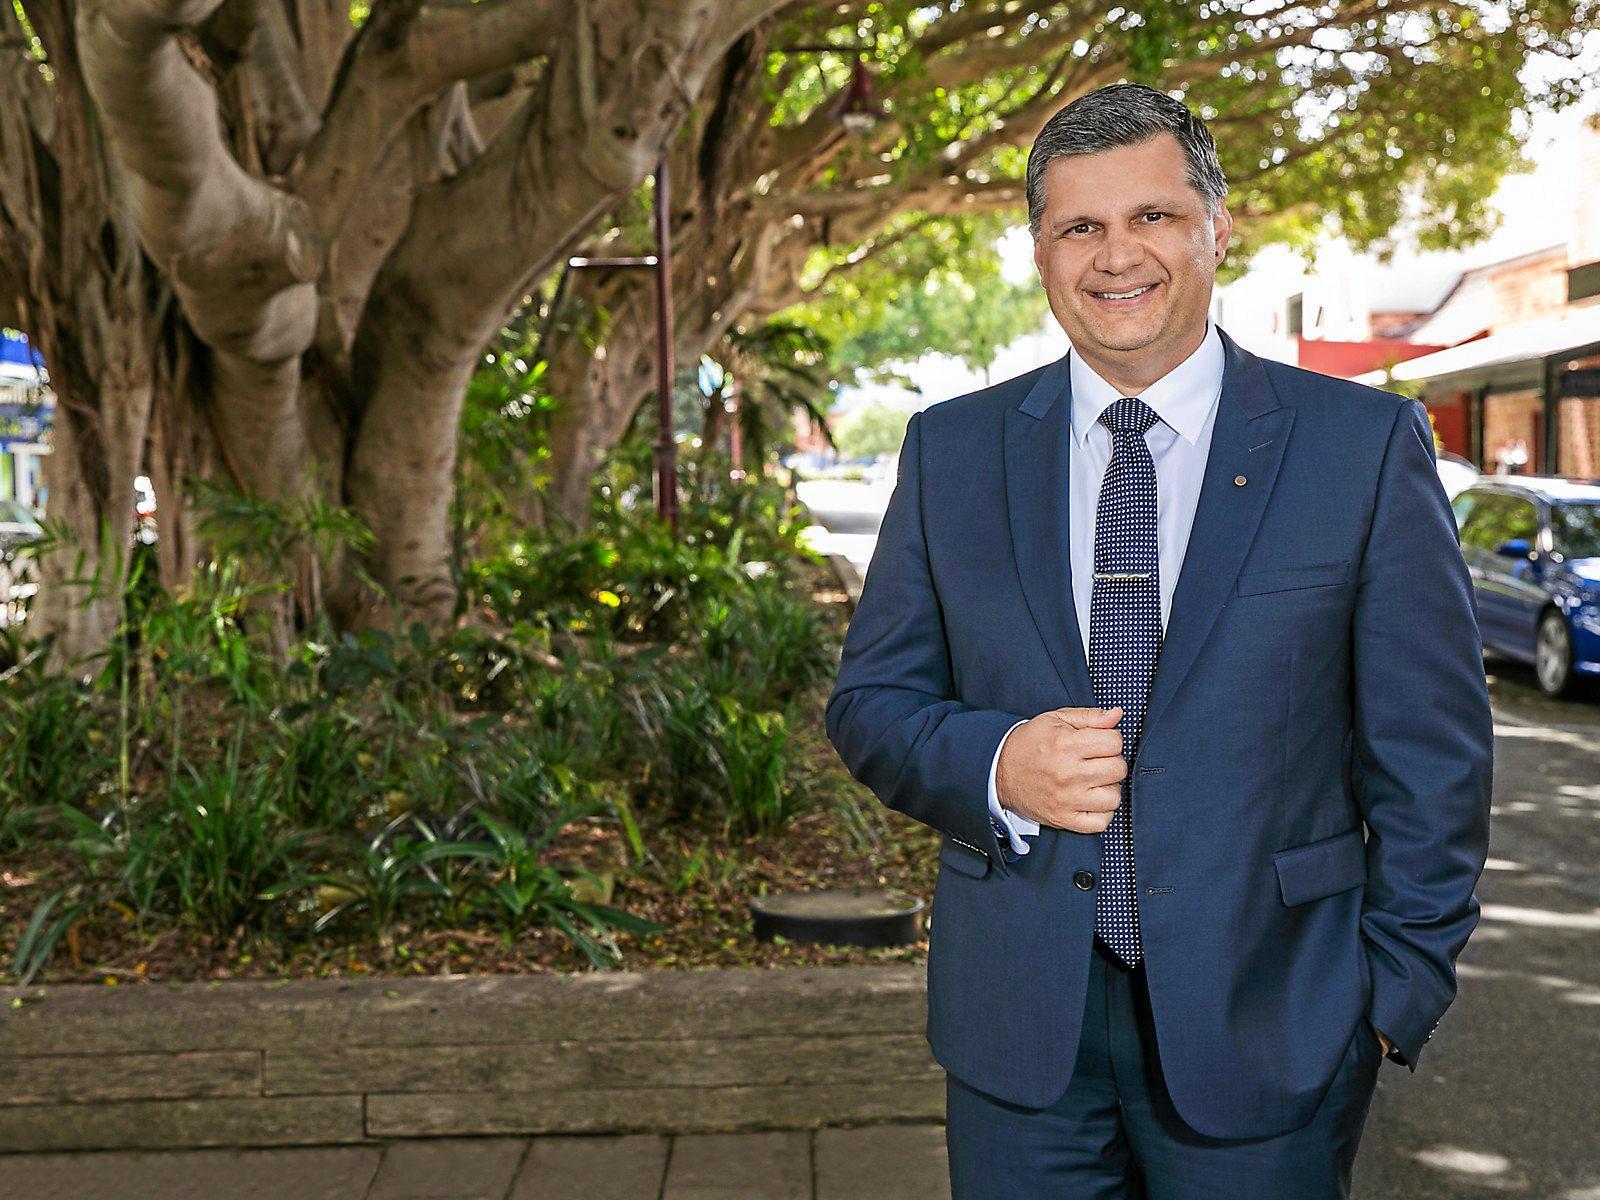 Coffs Harbour Chamber of Commerce President Martin Wells.